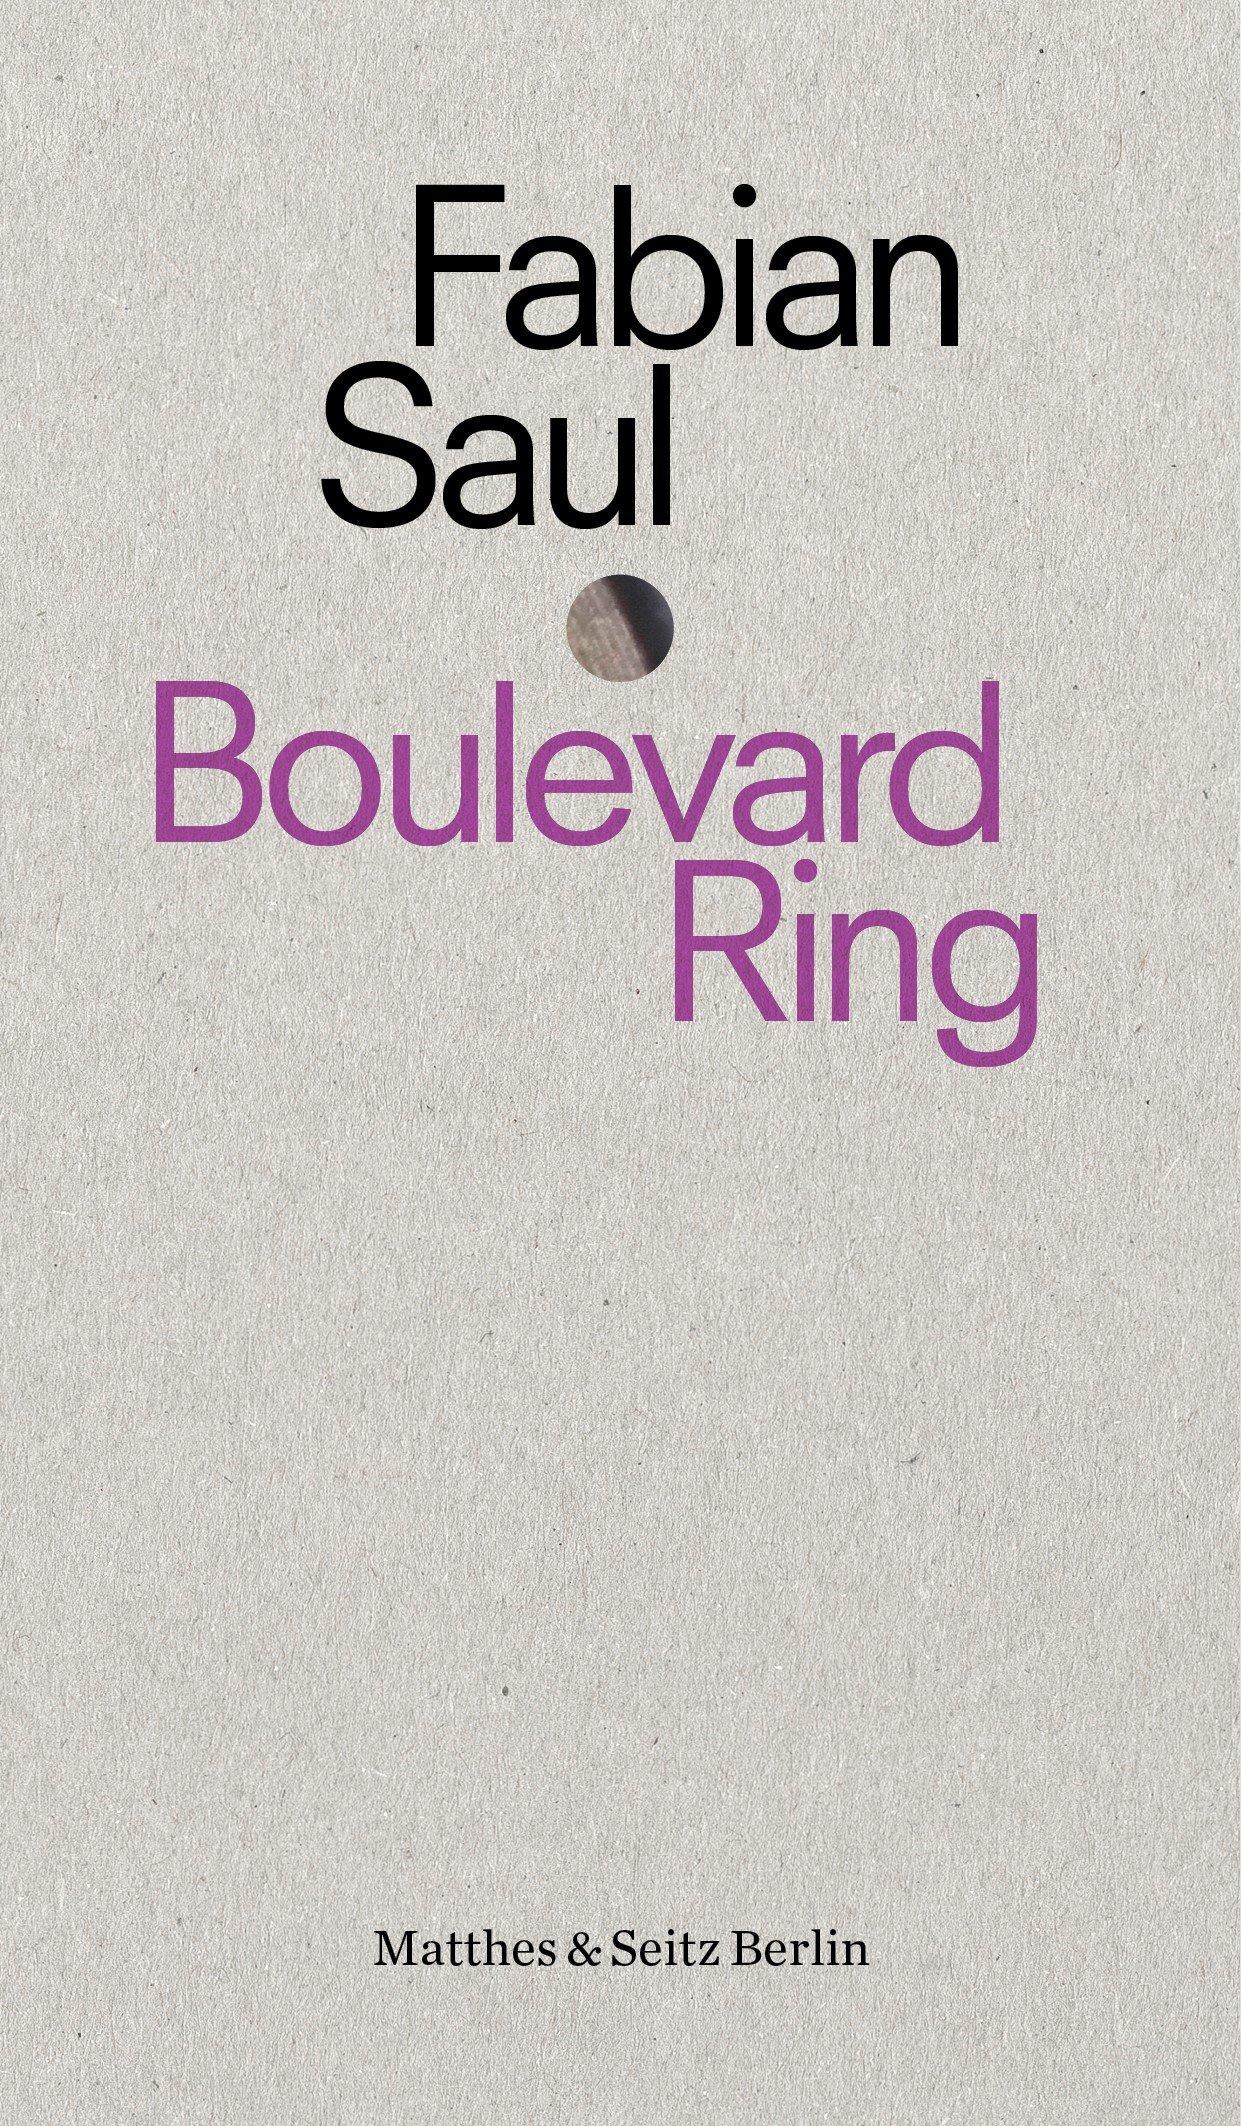 Boulevard Ring (punctum) Taschenbuch – 22. Oktober 2018 Fabian Saul Matthes & Seitz Berlin 3957576326 Geschichte / Kulturgeschichte